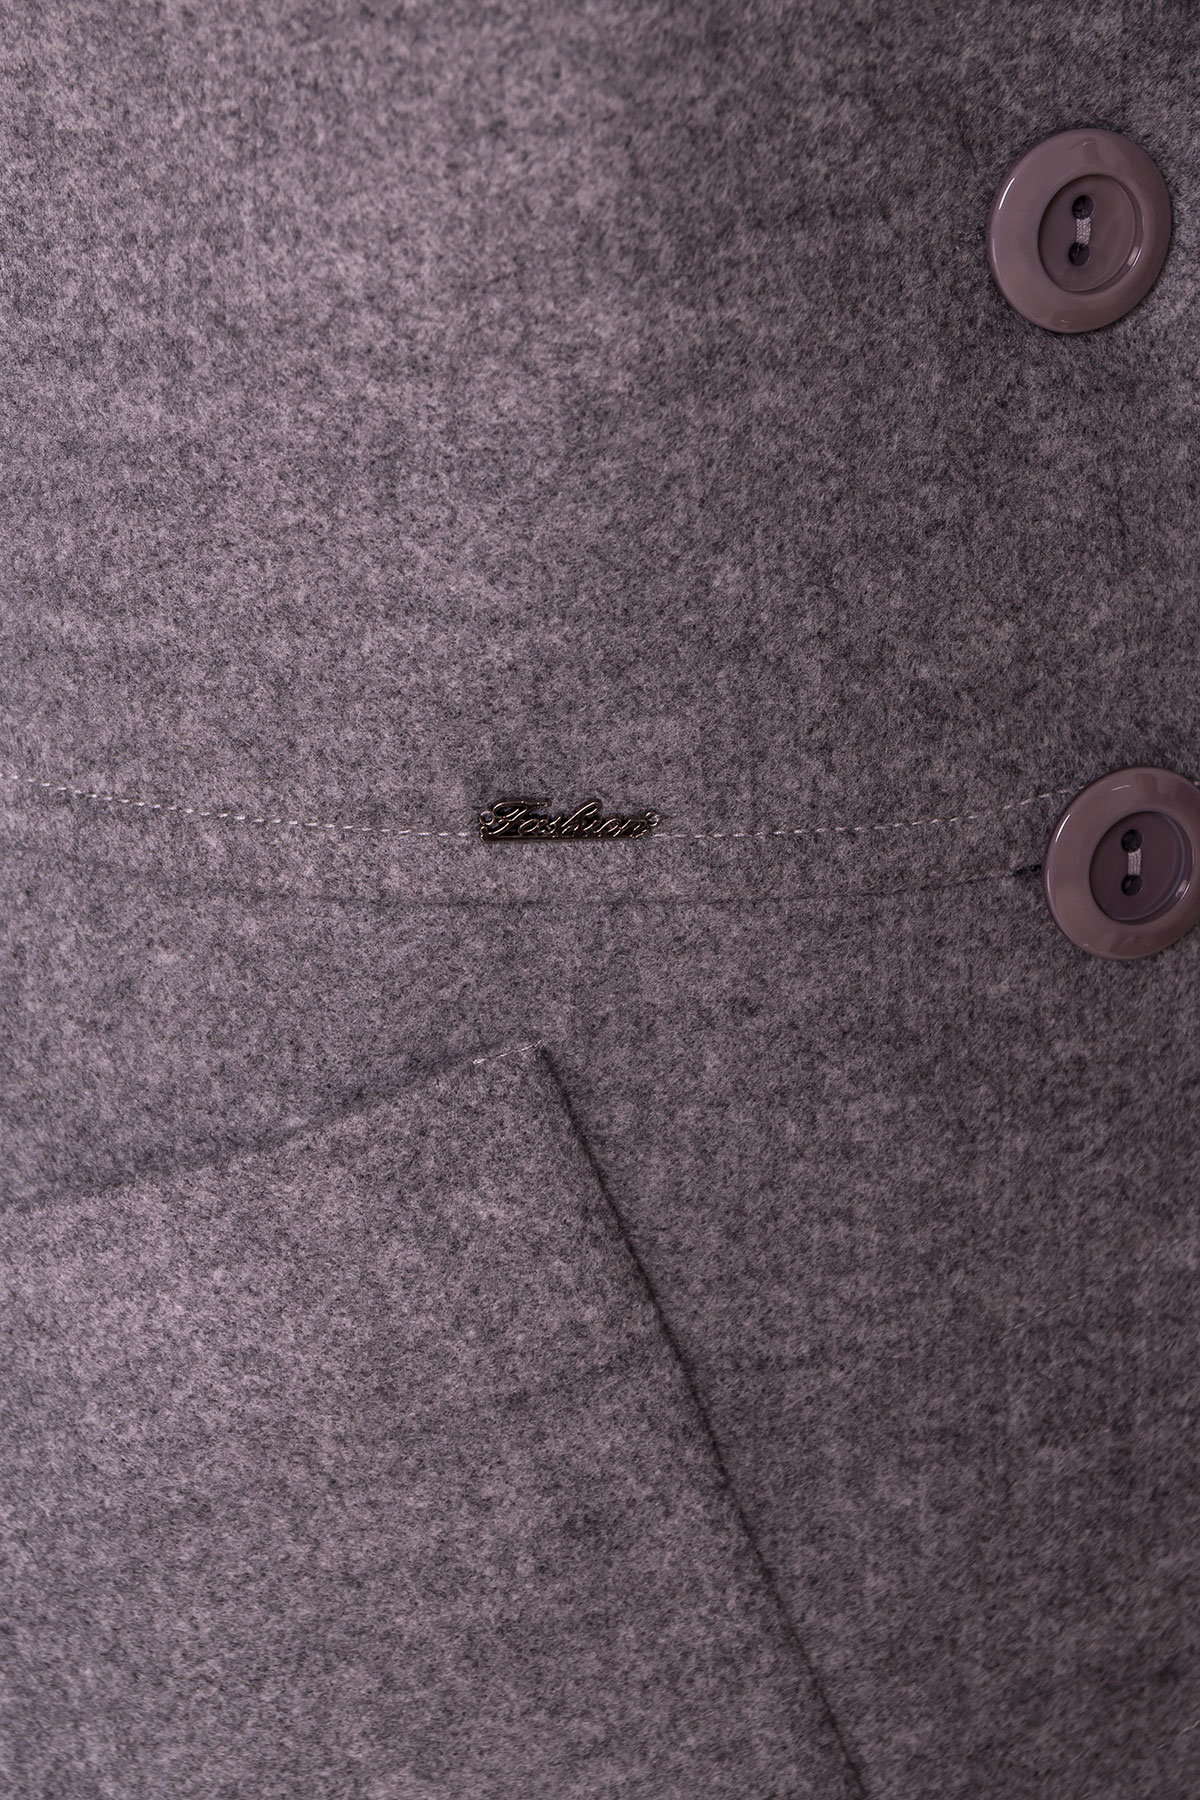 Пальто Габриэлла 4459 АРТ. 21654 Цвет: Серый 18 - фото 5, интернет магазин tm-modus.ru